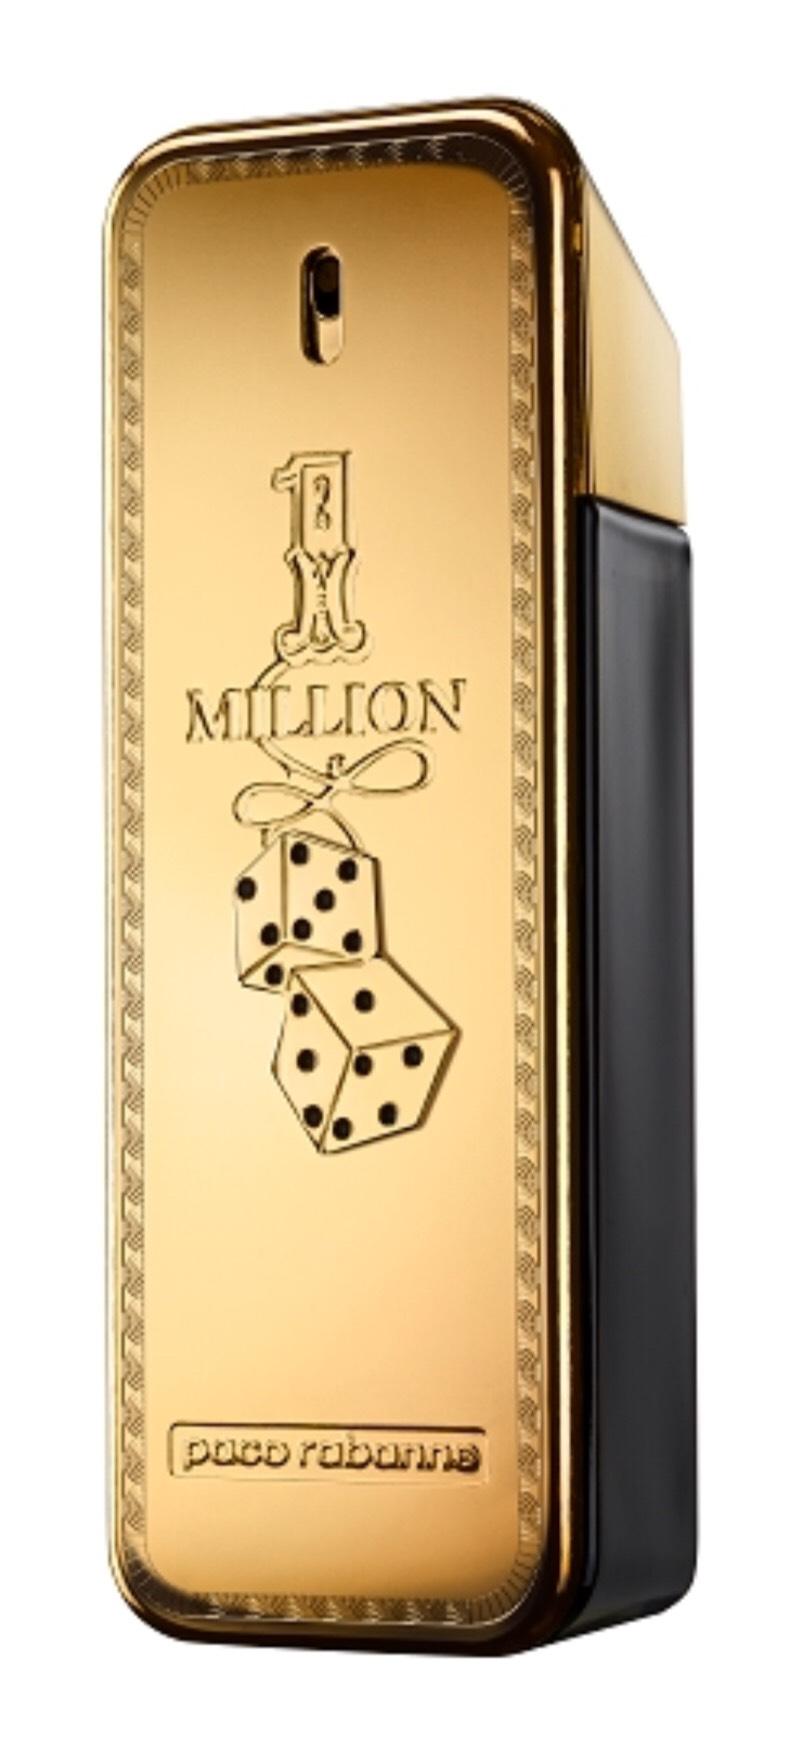 Paco Rabanne 1 Million Monopoly Collector Eau De Toilette 100ml Spray for £45.65 (with code) @ Fragrance Shop